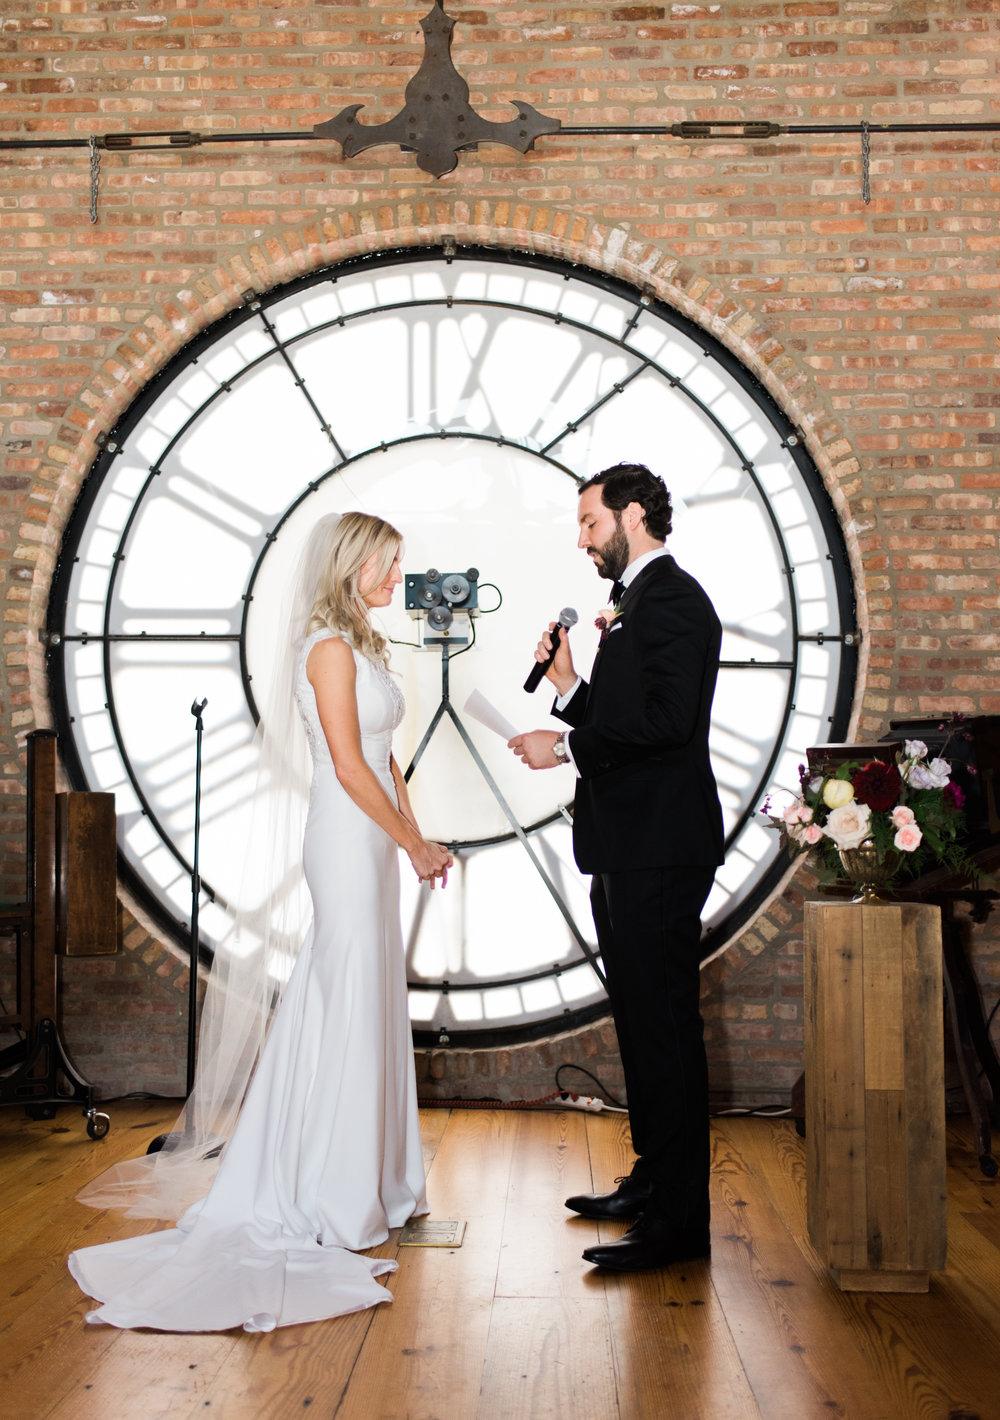 Bonphotage Chicago Fine Art Wedding Photography - Studio Manarchy